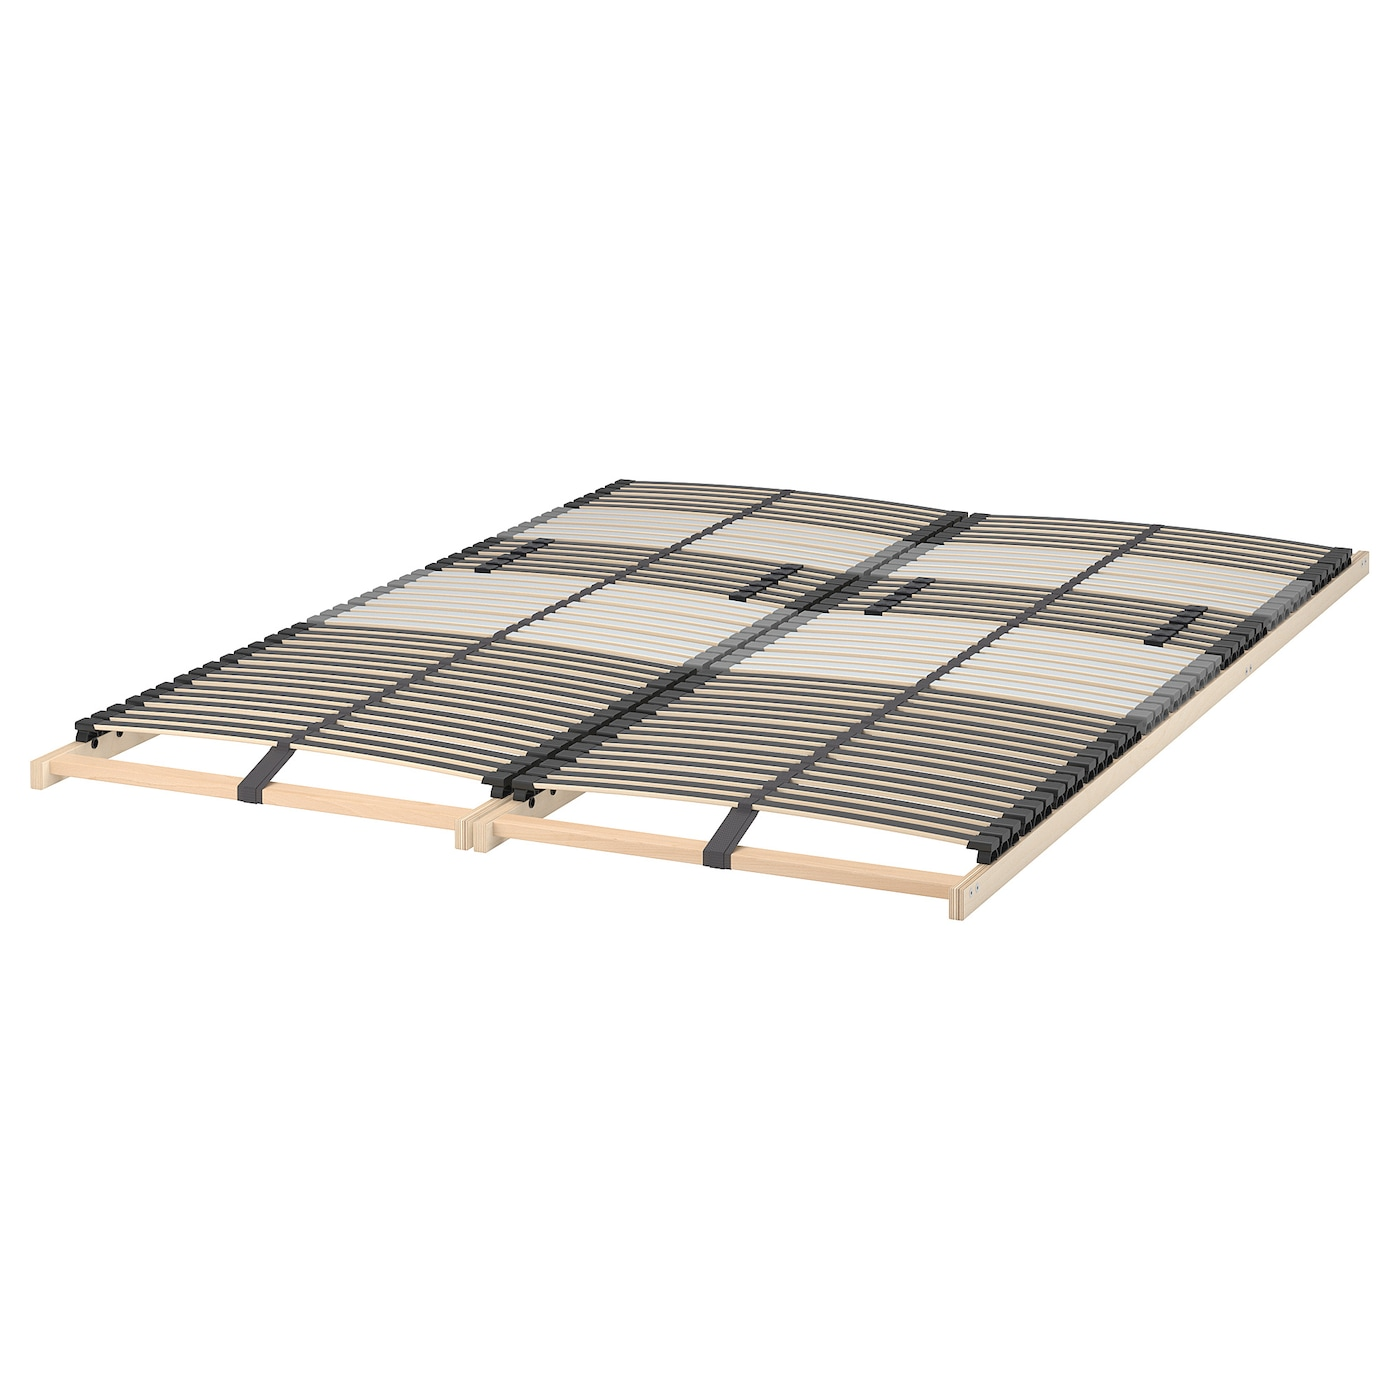 Ikea Leirsund Slatted Bed Base 6 Slats With Adjule Firmness